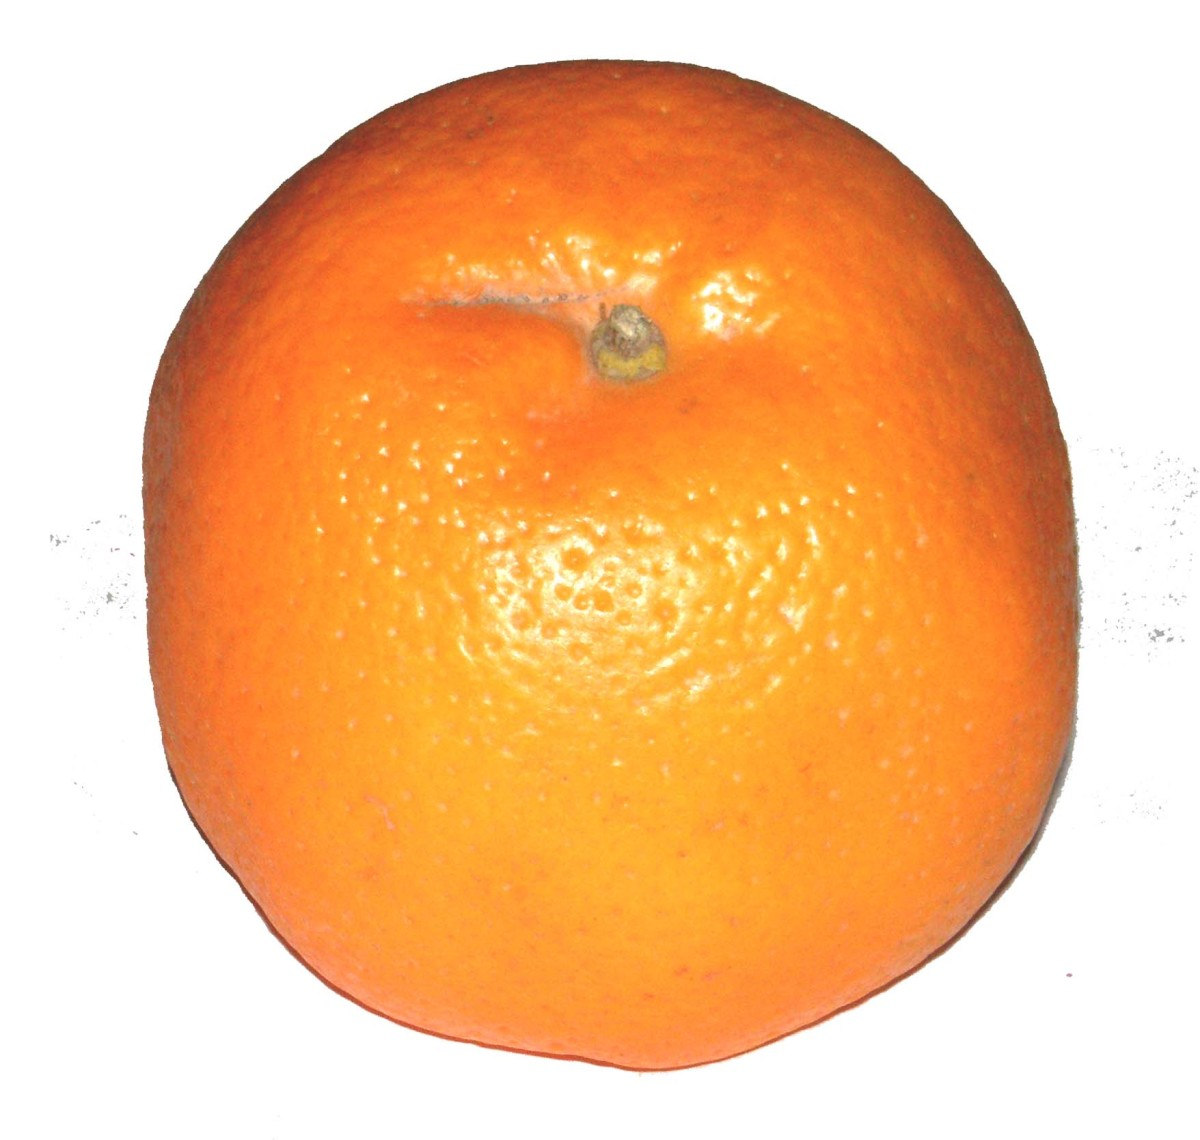 Oranges are juicy fruits